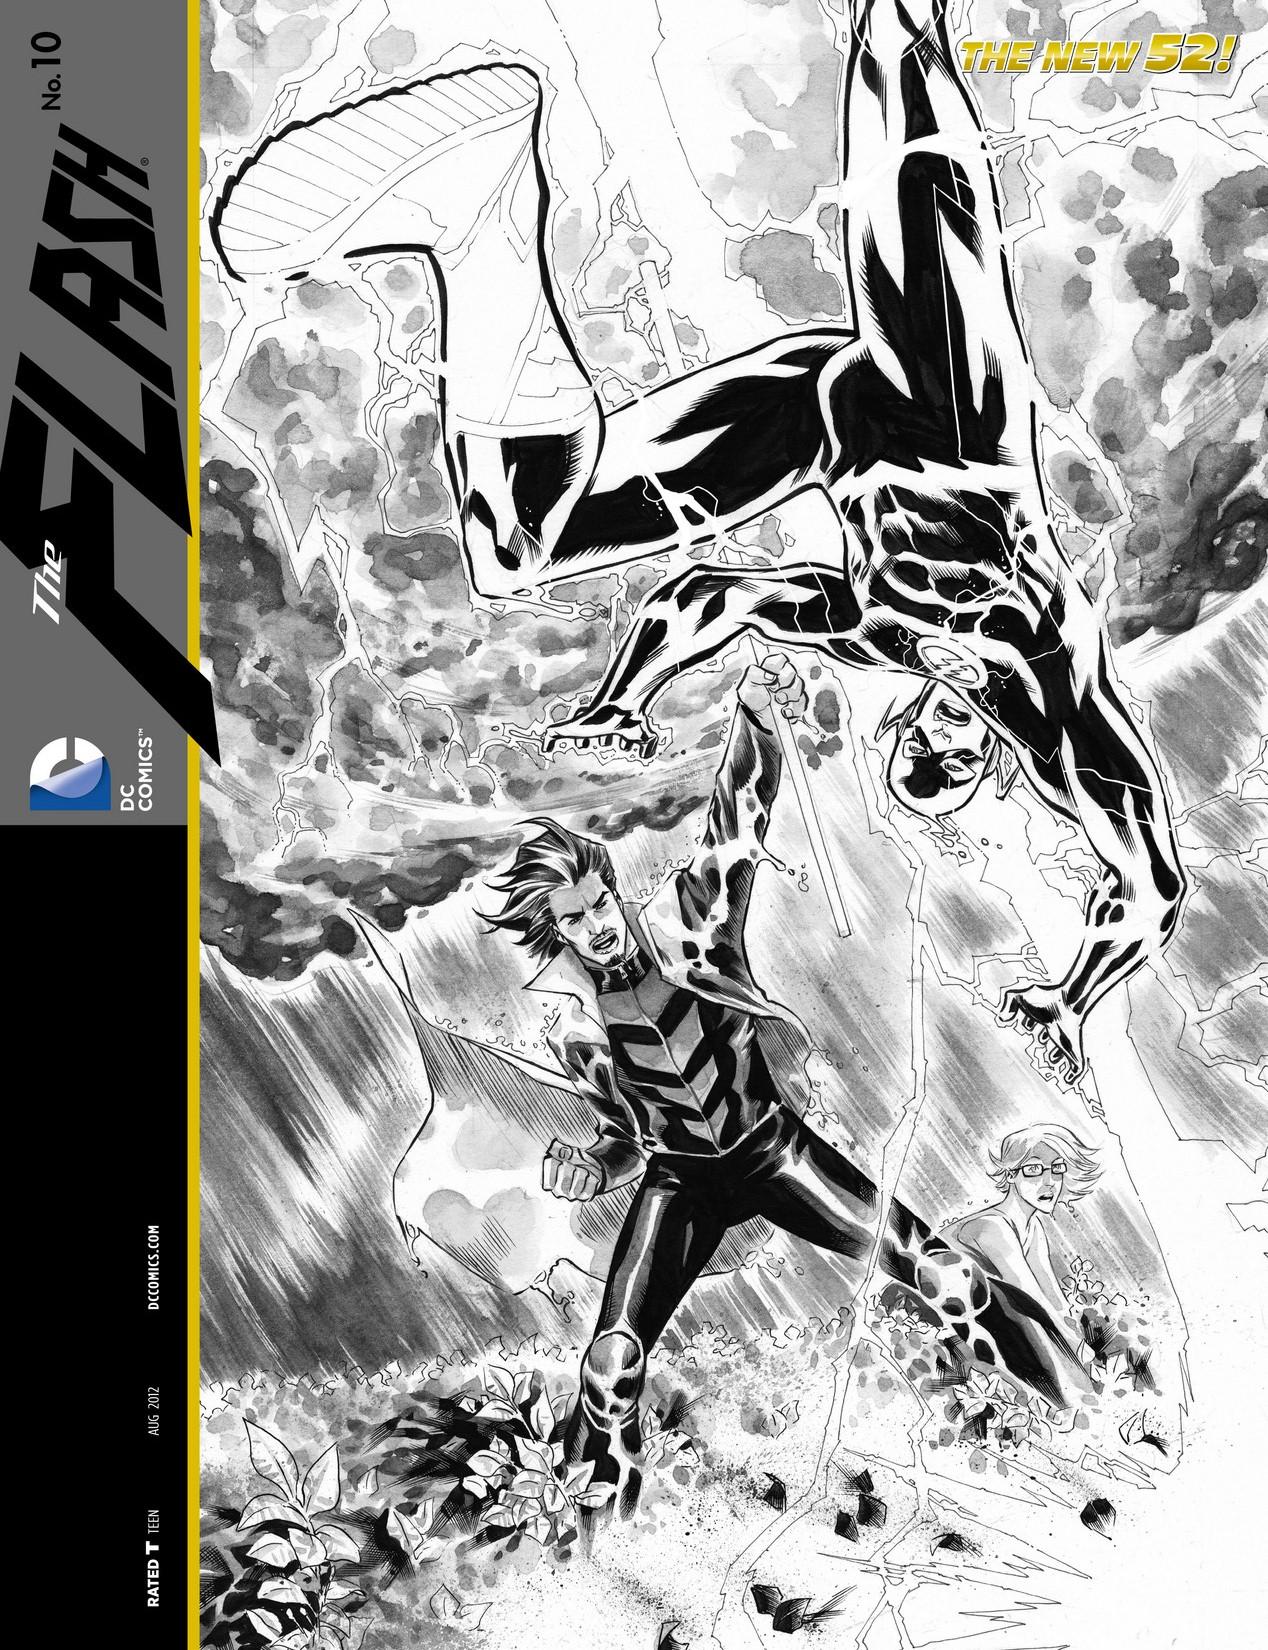 Flash Vol 4 10 Sketch.jpg